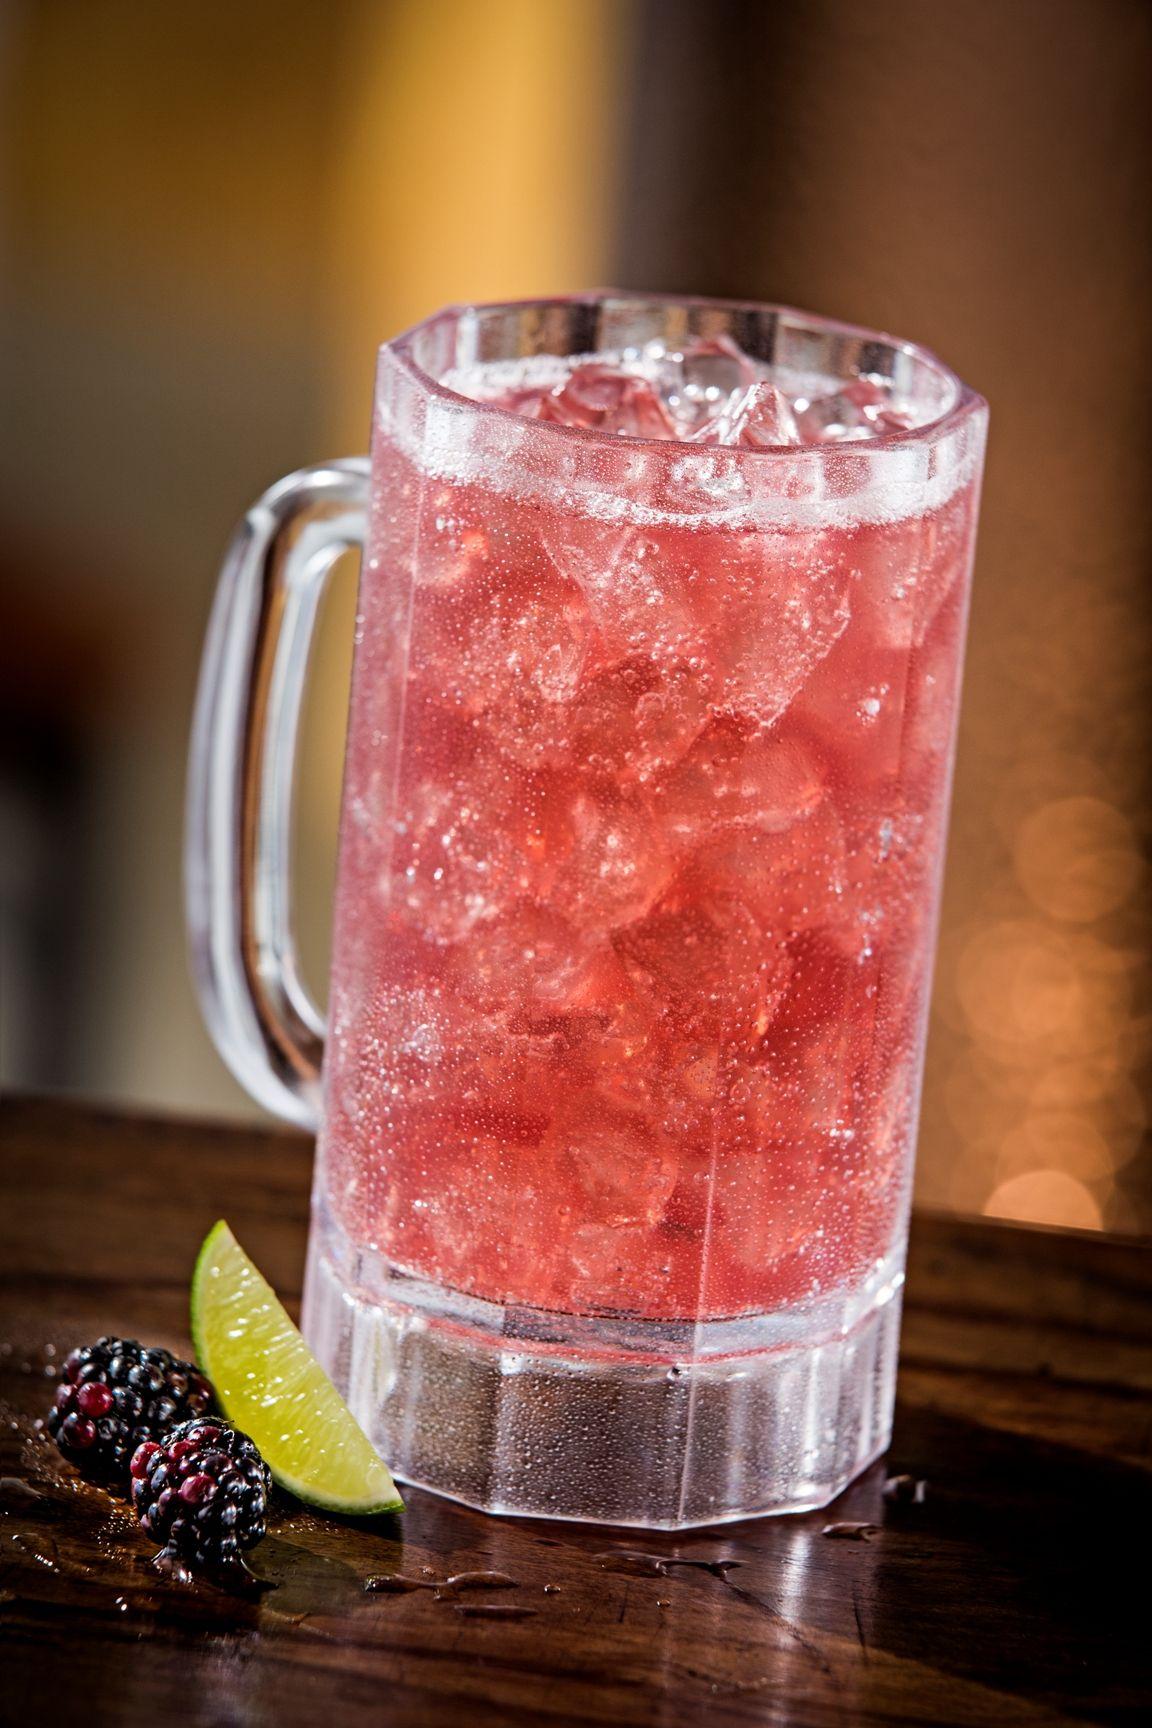 Blackberry Lemonade Refreshing Lemonade With A Kick Chilis Non Alcoholic Drinks Hot Yummy Drinks Iced Tea Recipes